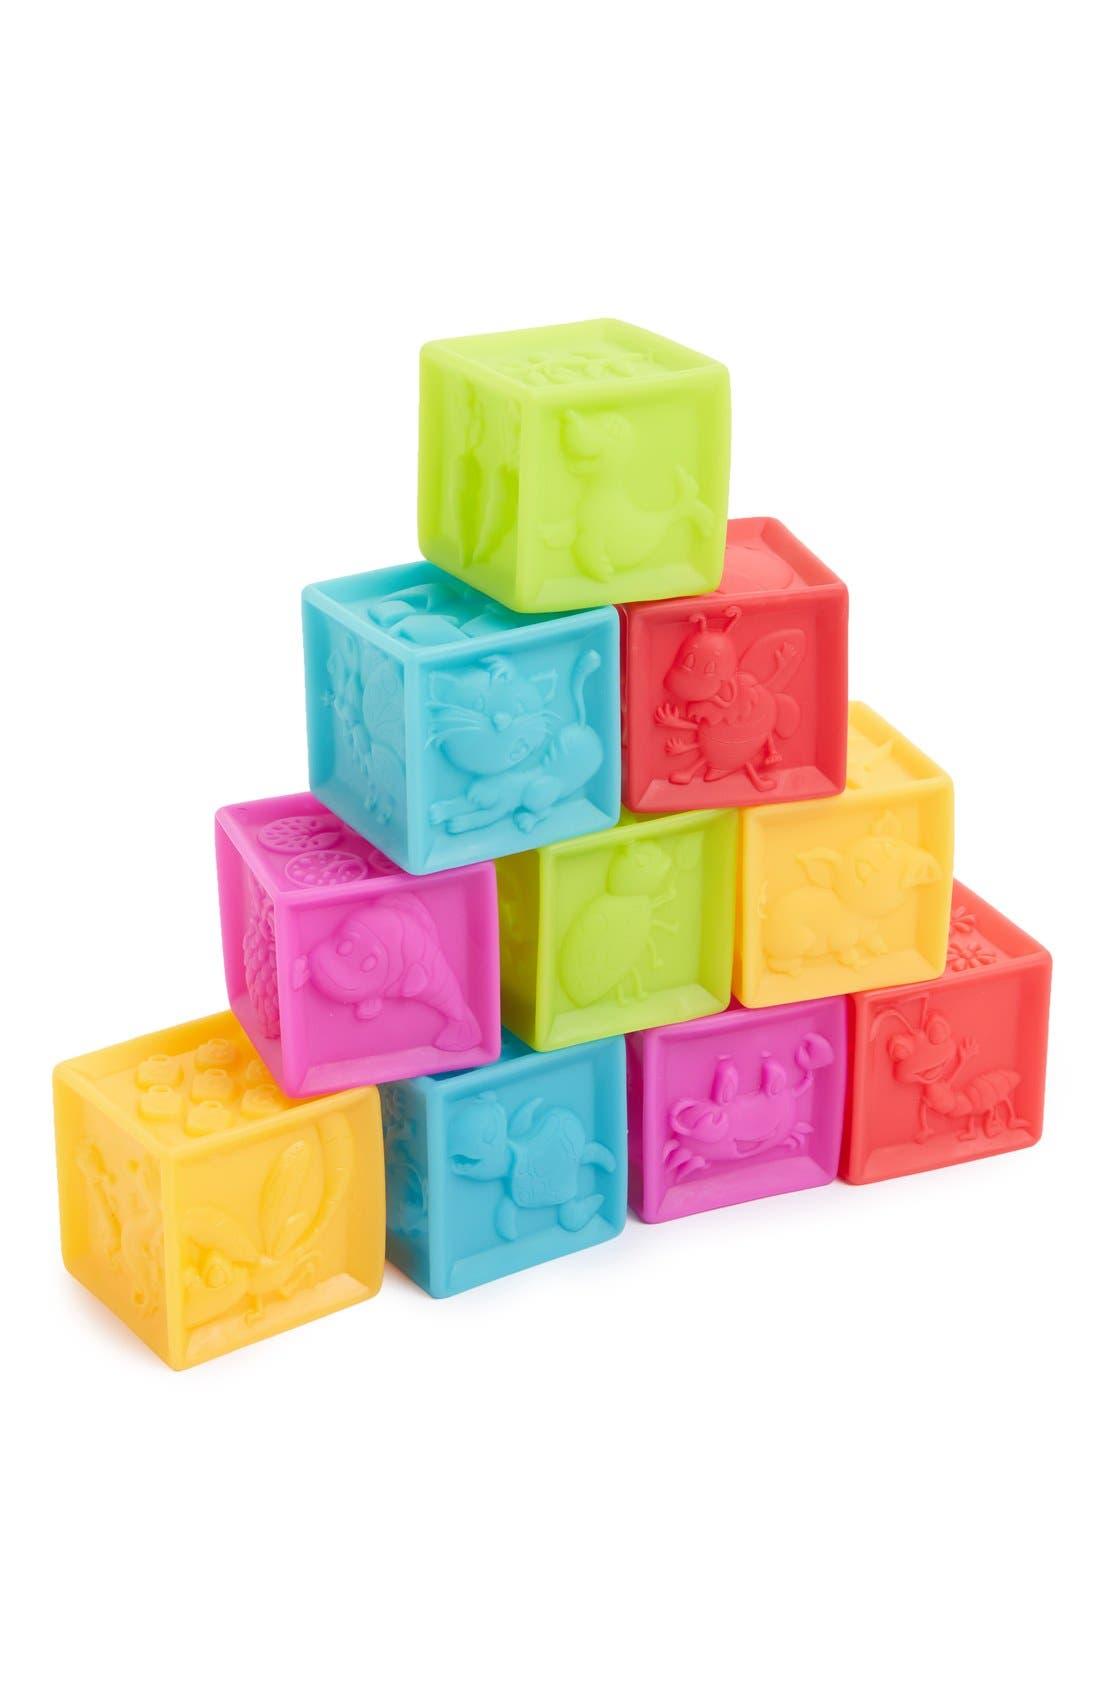 HEDSTROM 'Lil Sensory Bloxx' Toy Set